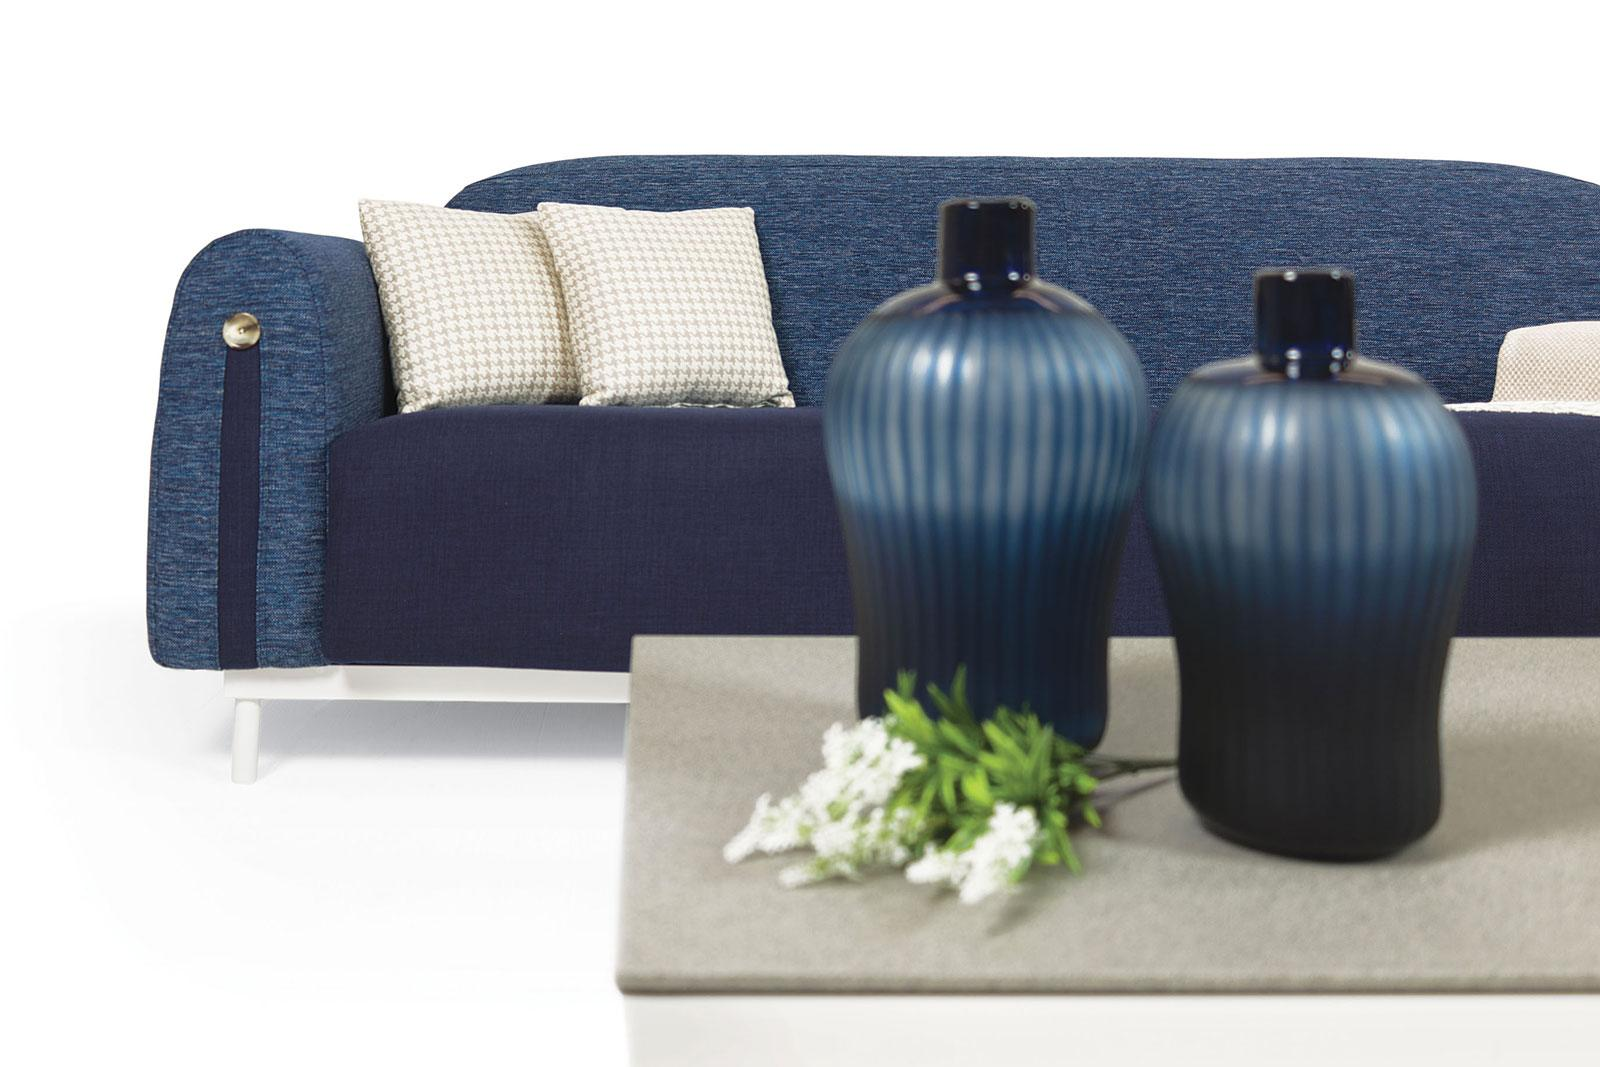 Canap de jardin vente en ligne italy dream design for Vente en ligne jardin